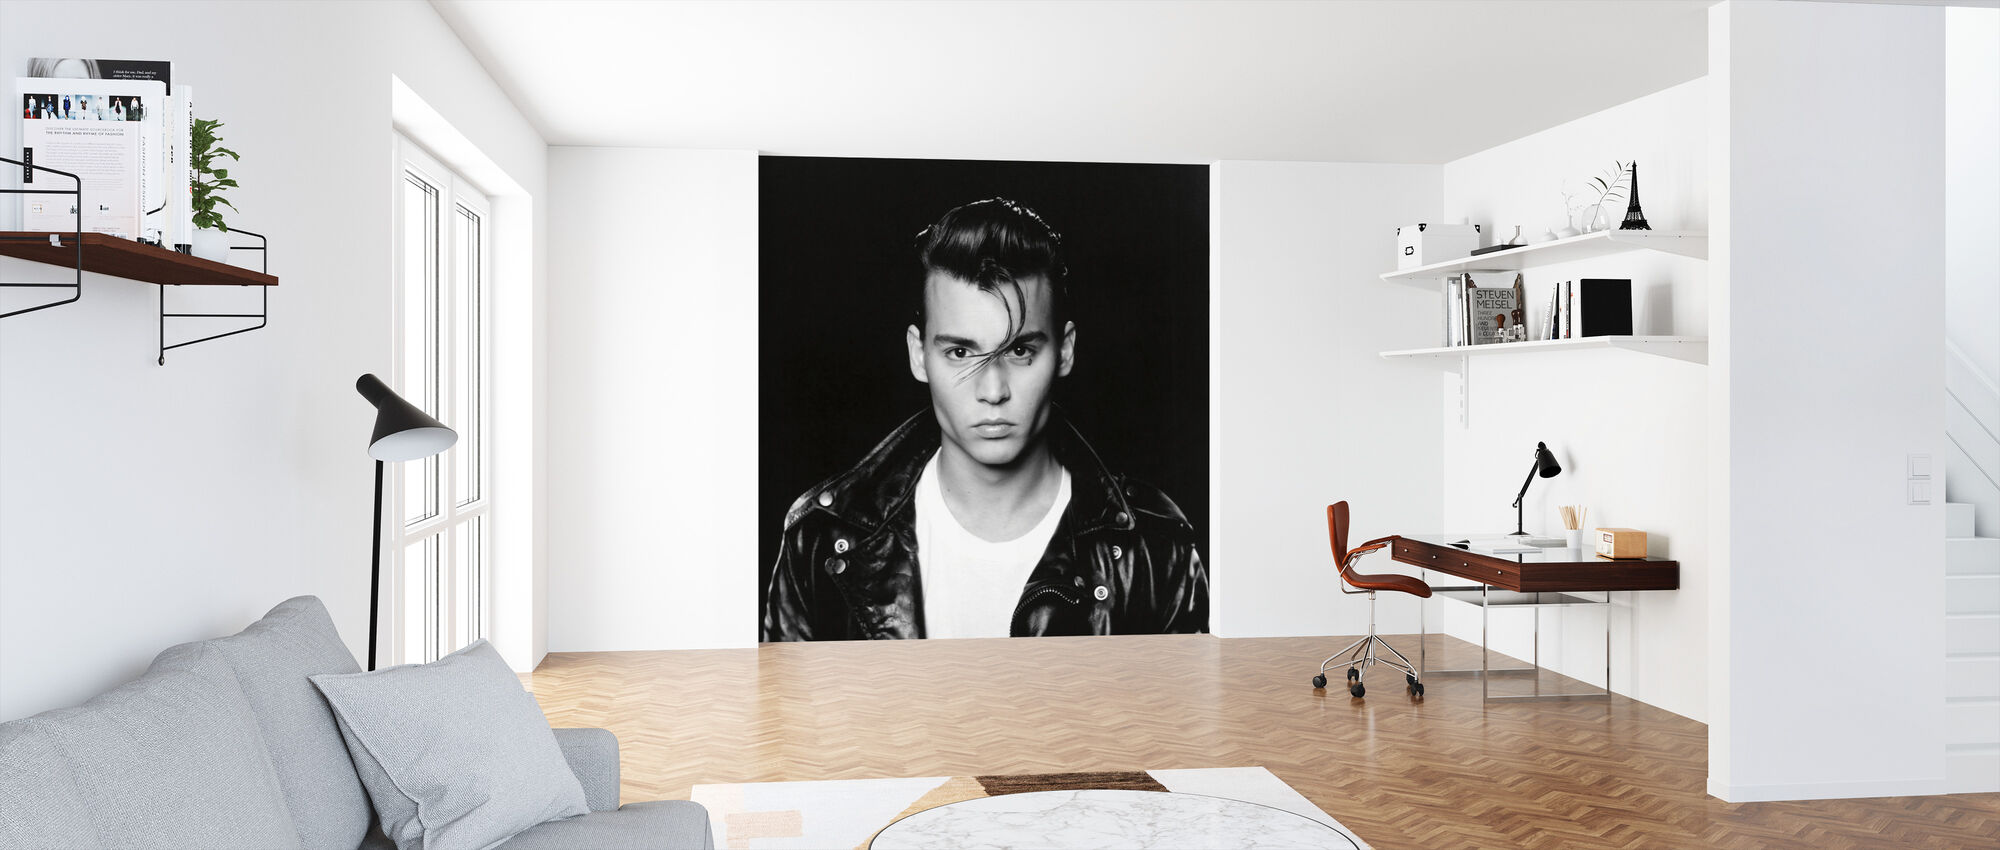 Johnny Depp in Crybaby - Wallpaper - Office